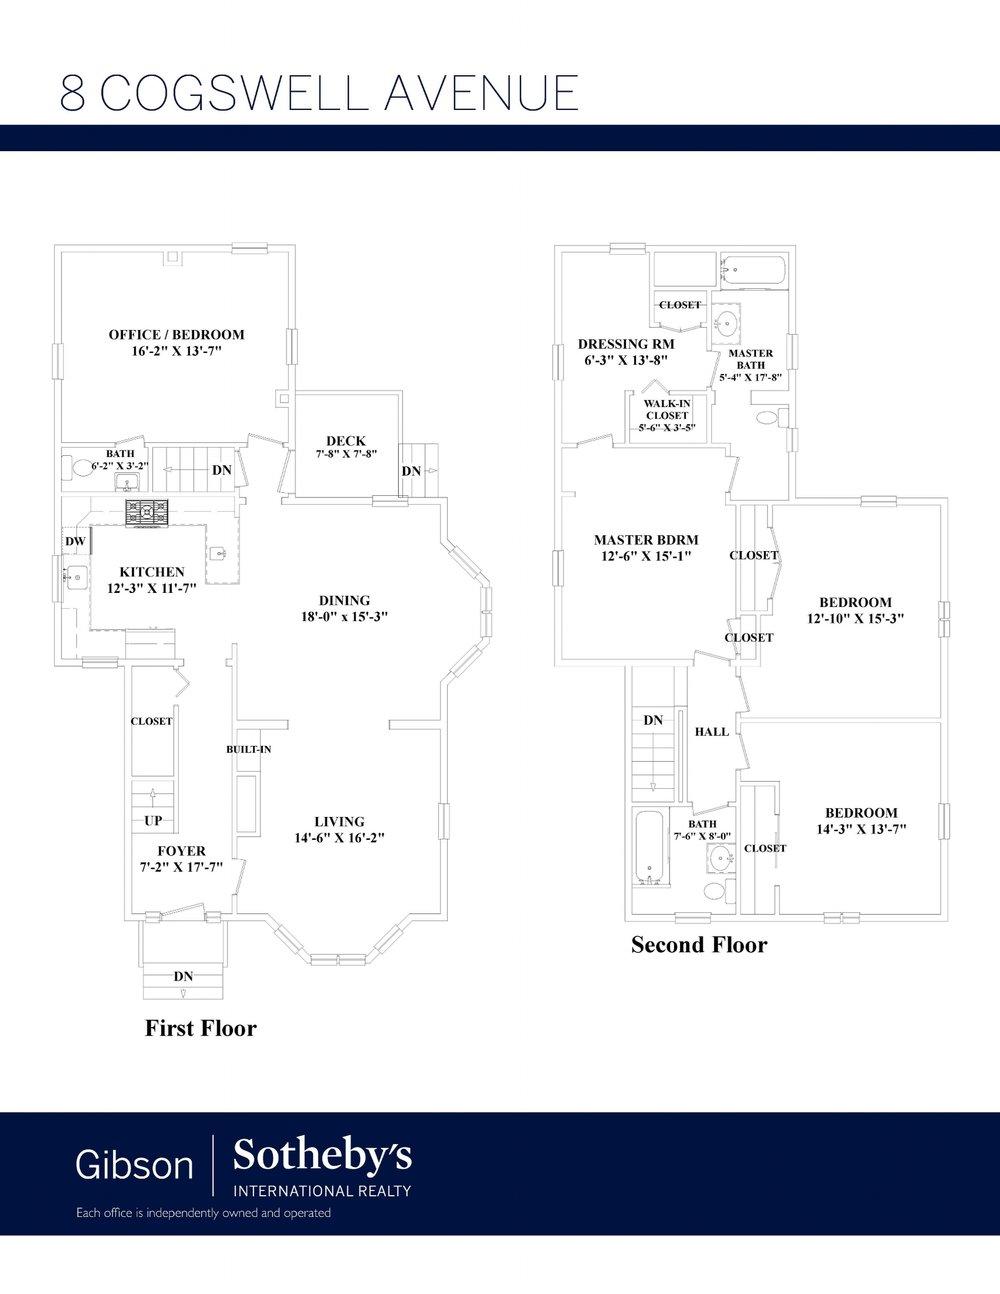 8 cogswell floorplan - 1&2.jpg